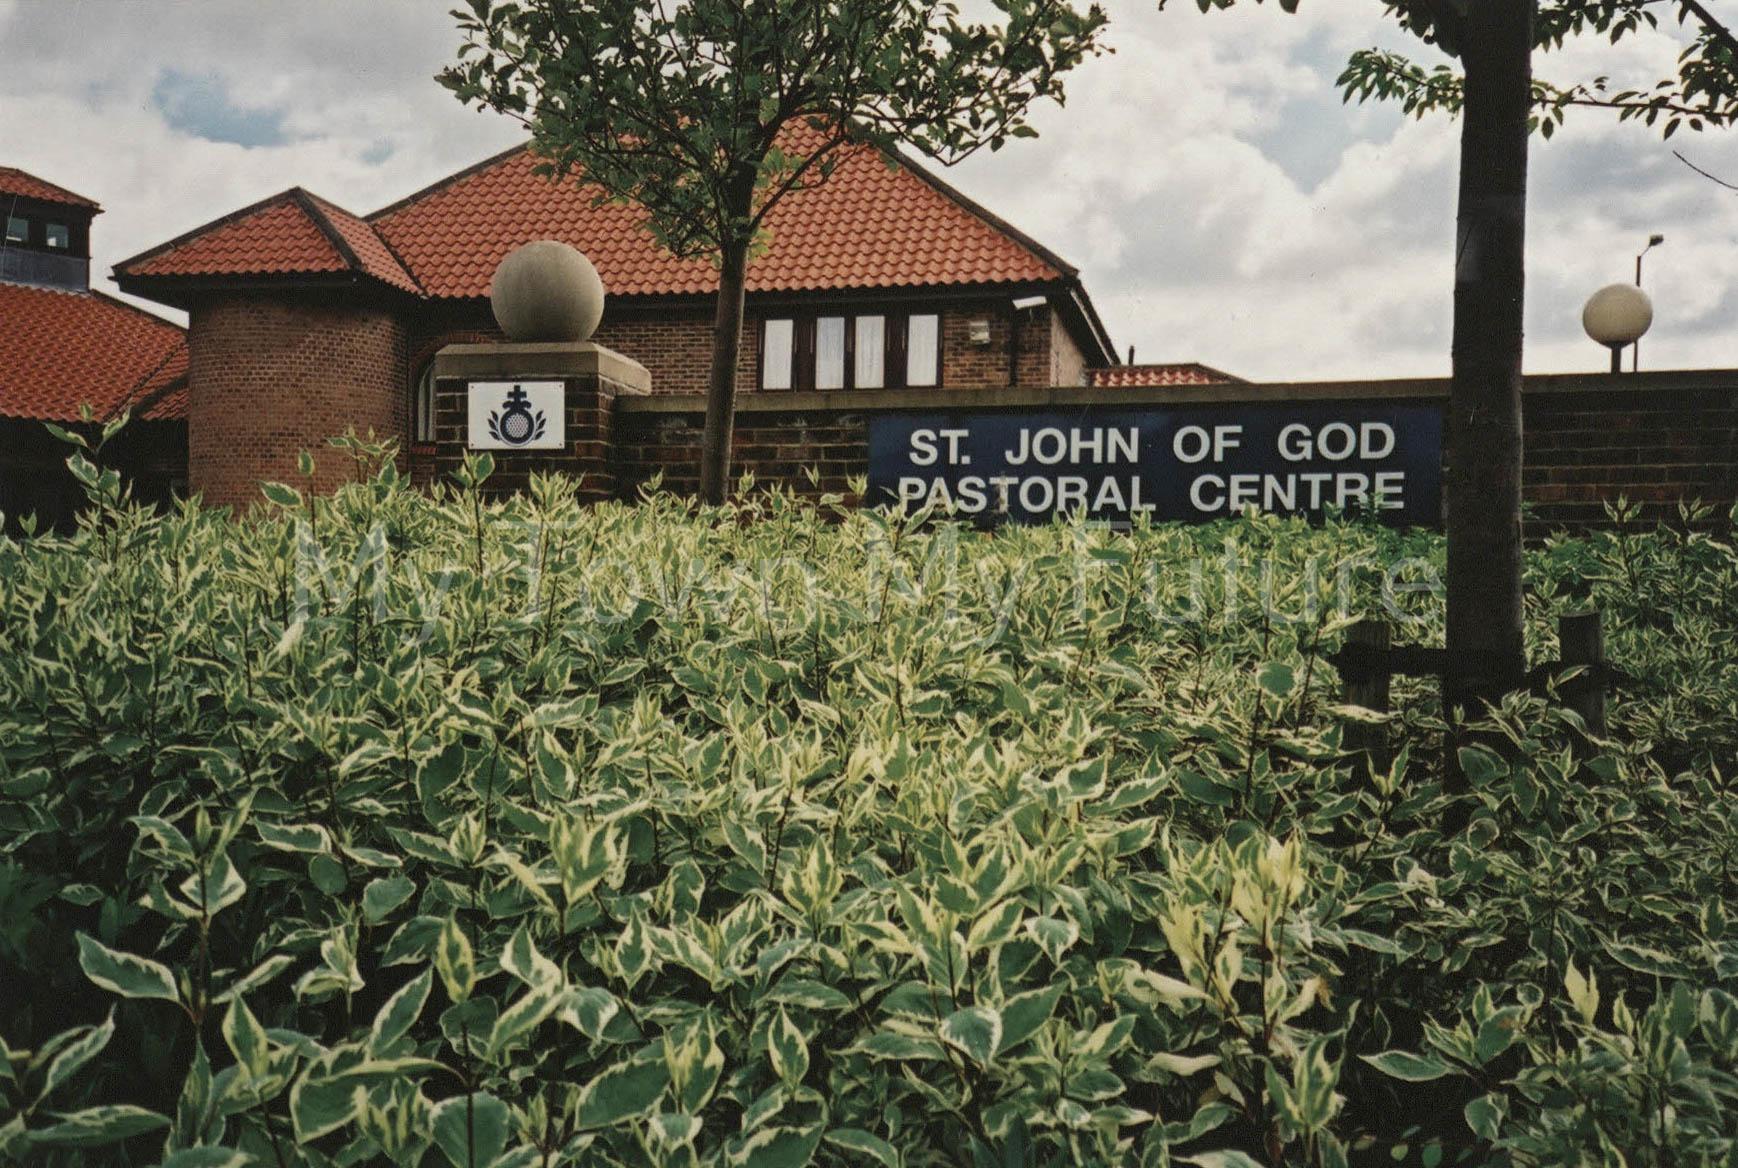 St John Of God Pastoral Centre